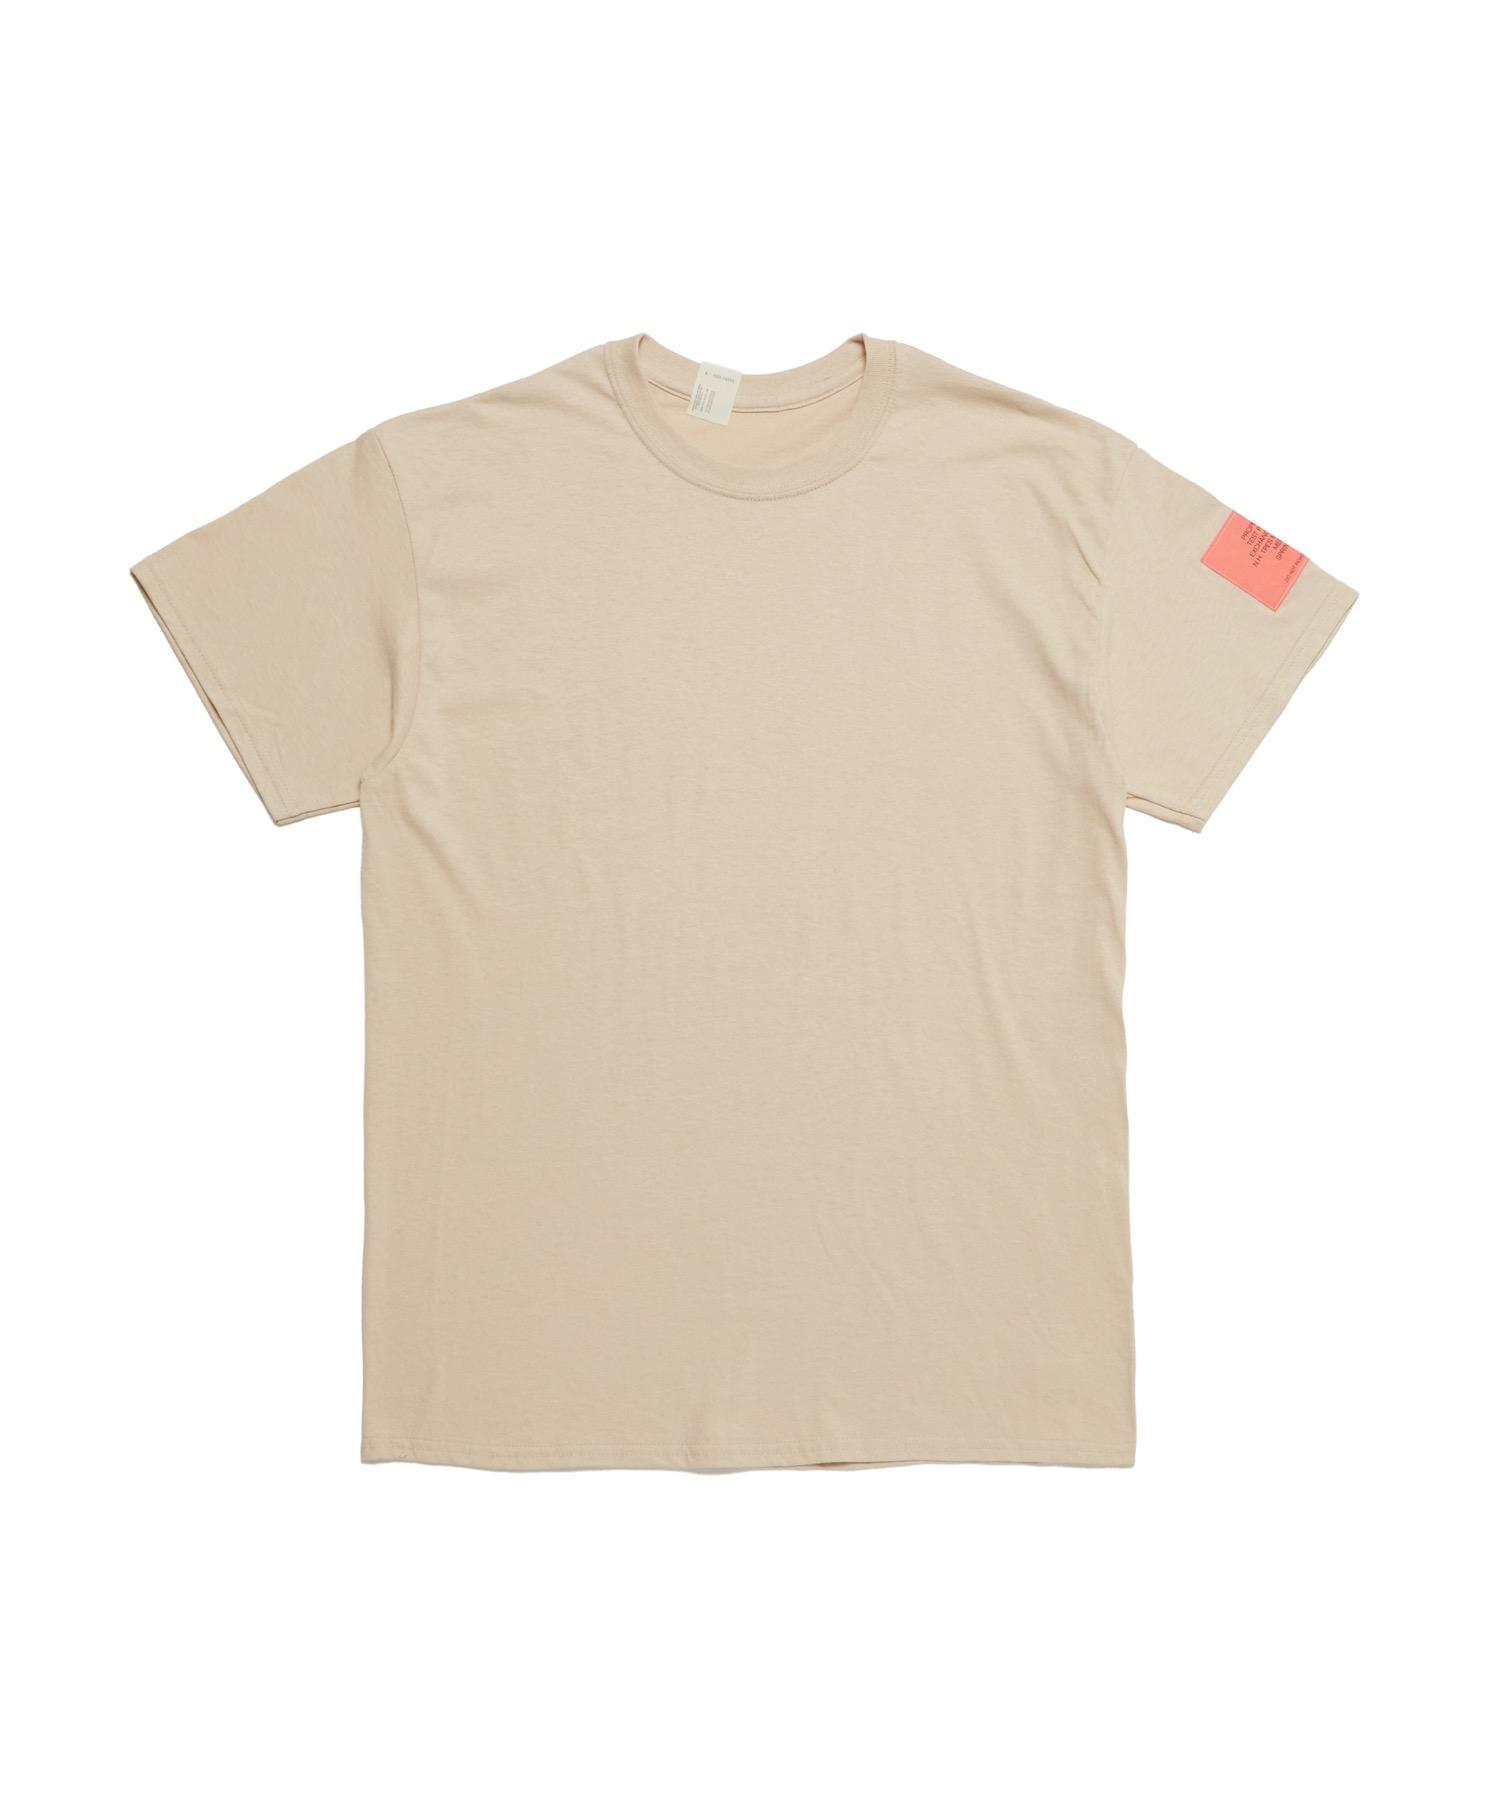 SPRING2021 CREW NECK LONG T-SHIRT